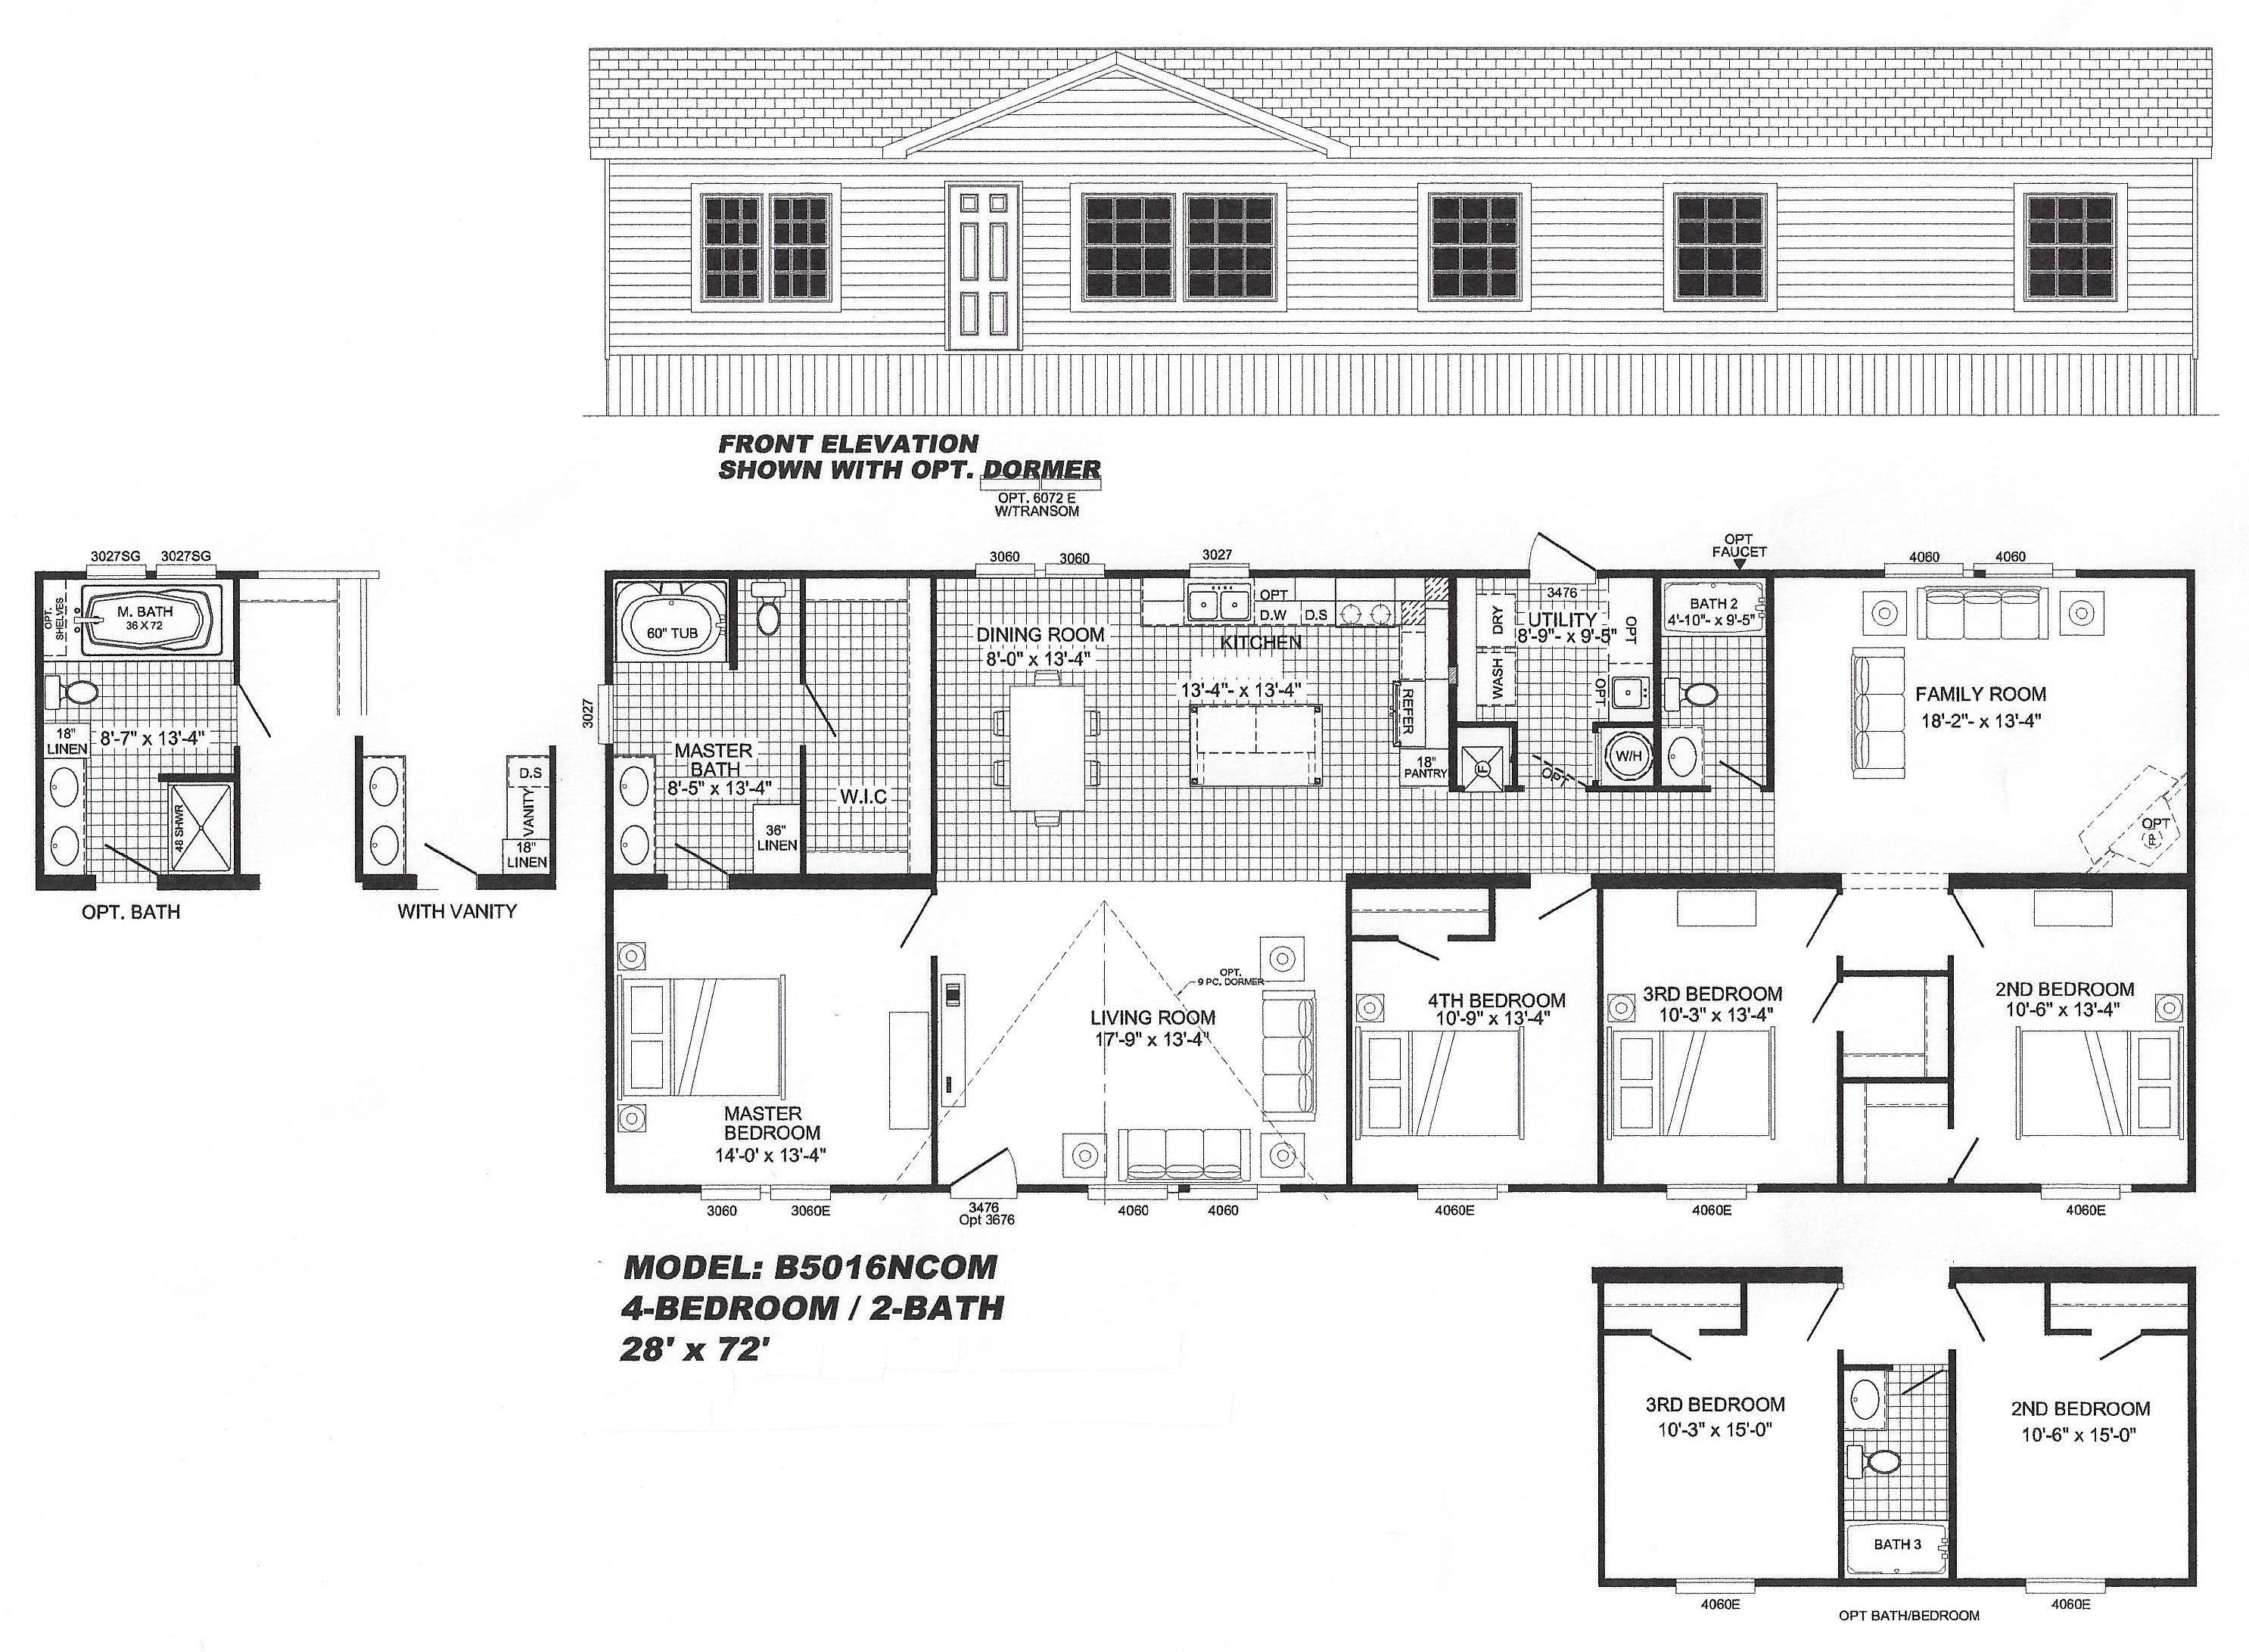 [DIAGRAM_1JK]  Belmont Trailer Wiring Diagram | Belmont Trailer Wiring Diagram |  | Netlify